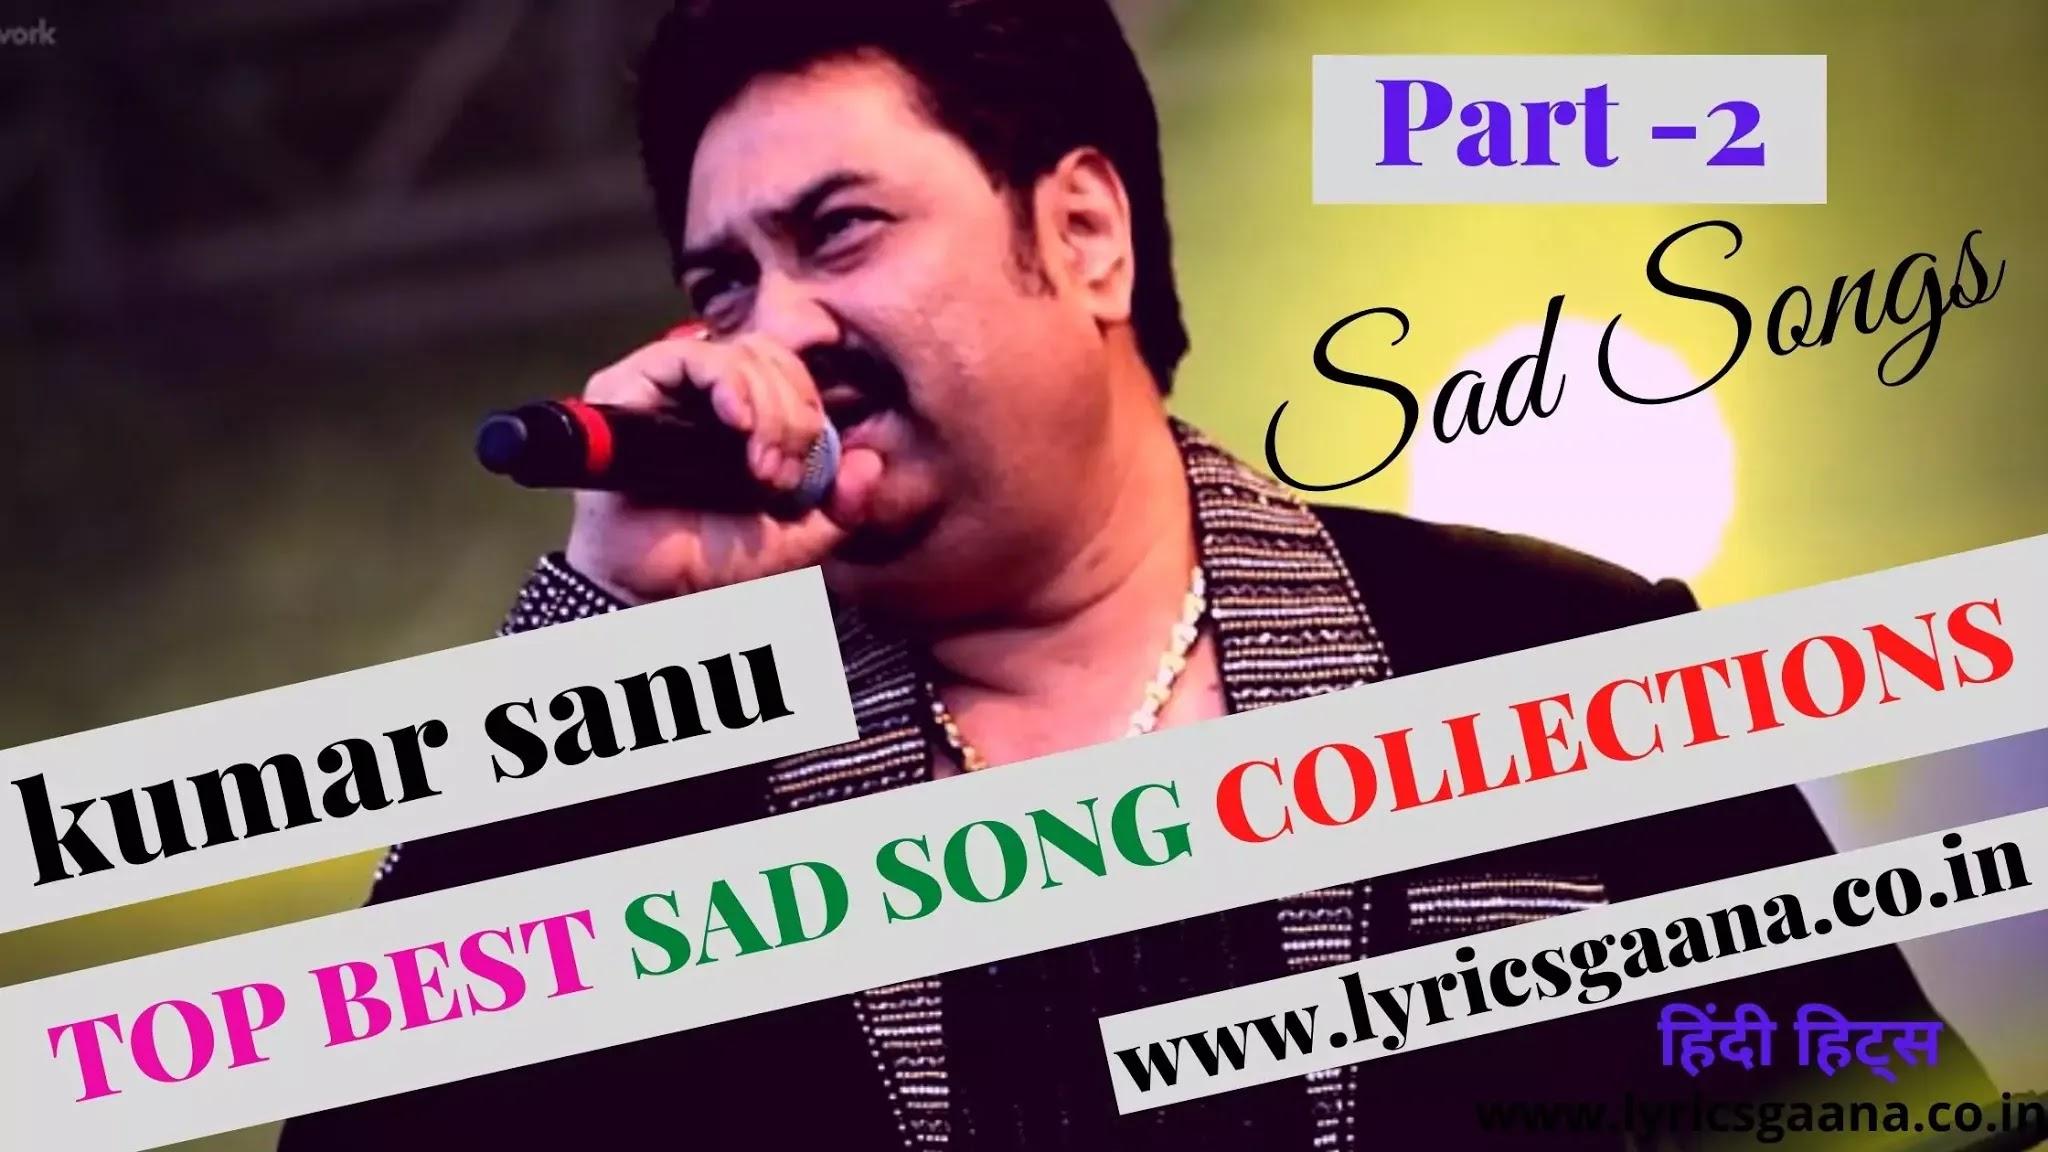 Kumar Sanu Sad Songs Collection | Hindi Sad Song Mp3 | Part - 2